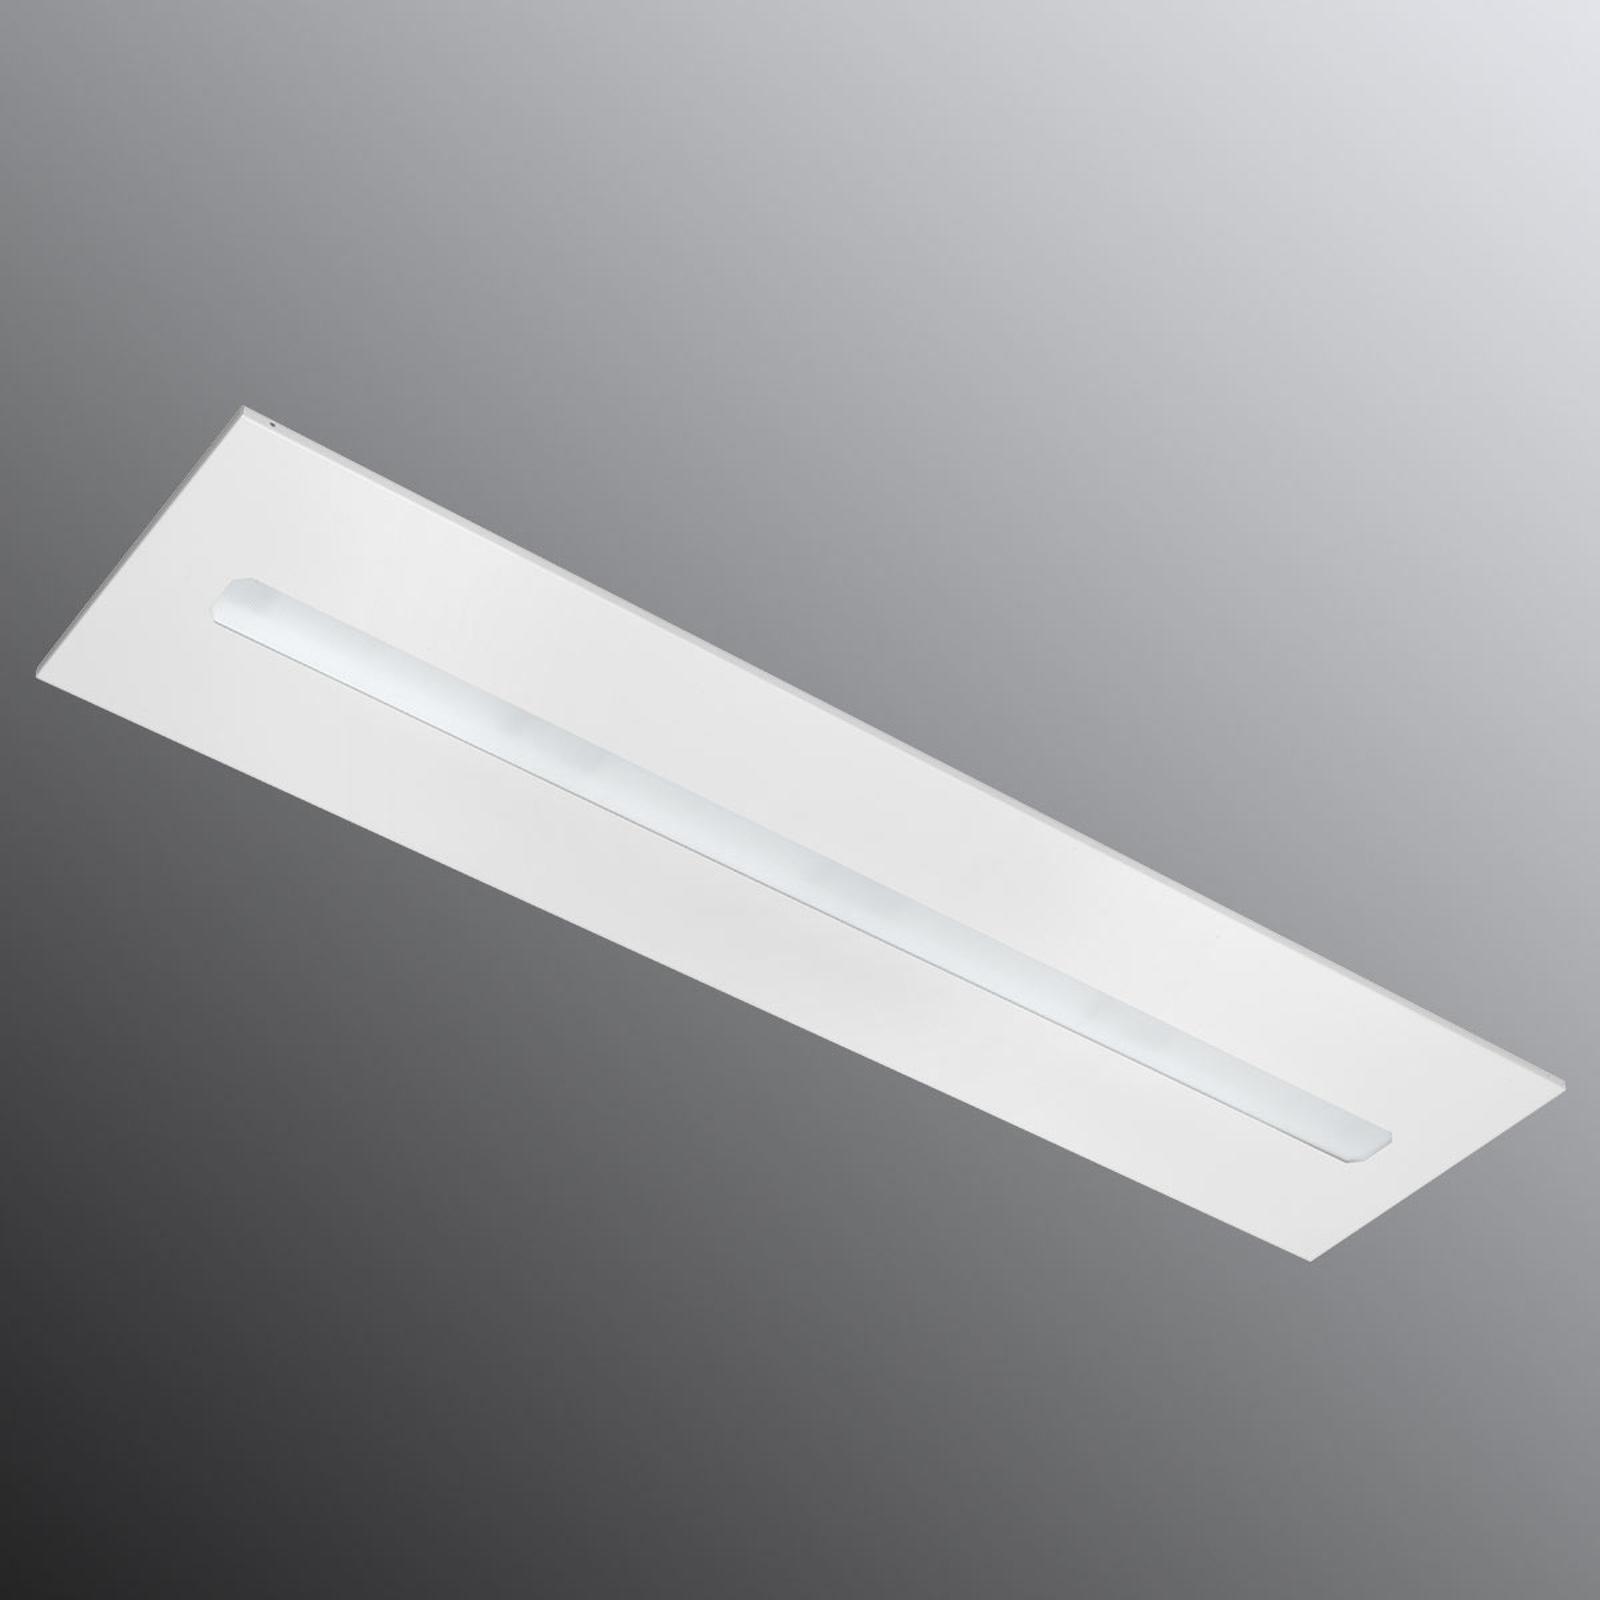 Freyn II Recessed LED panel 124.5 x 31 cm_7252115_1